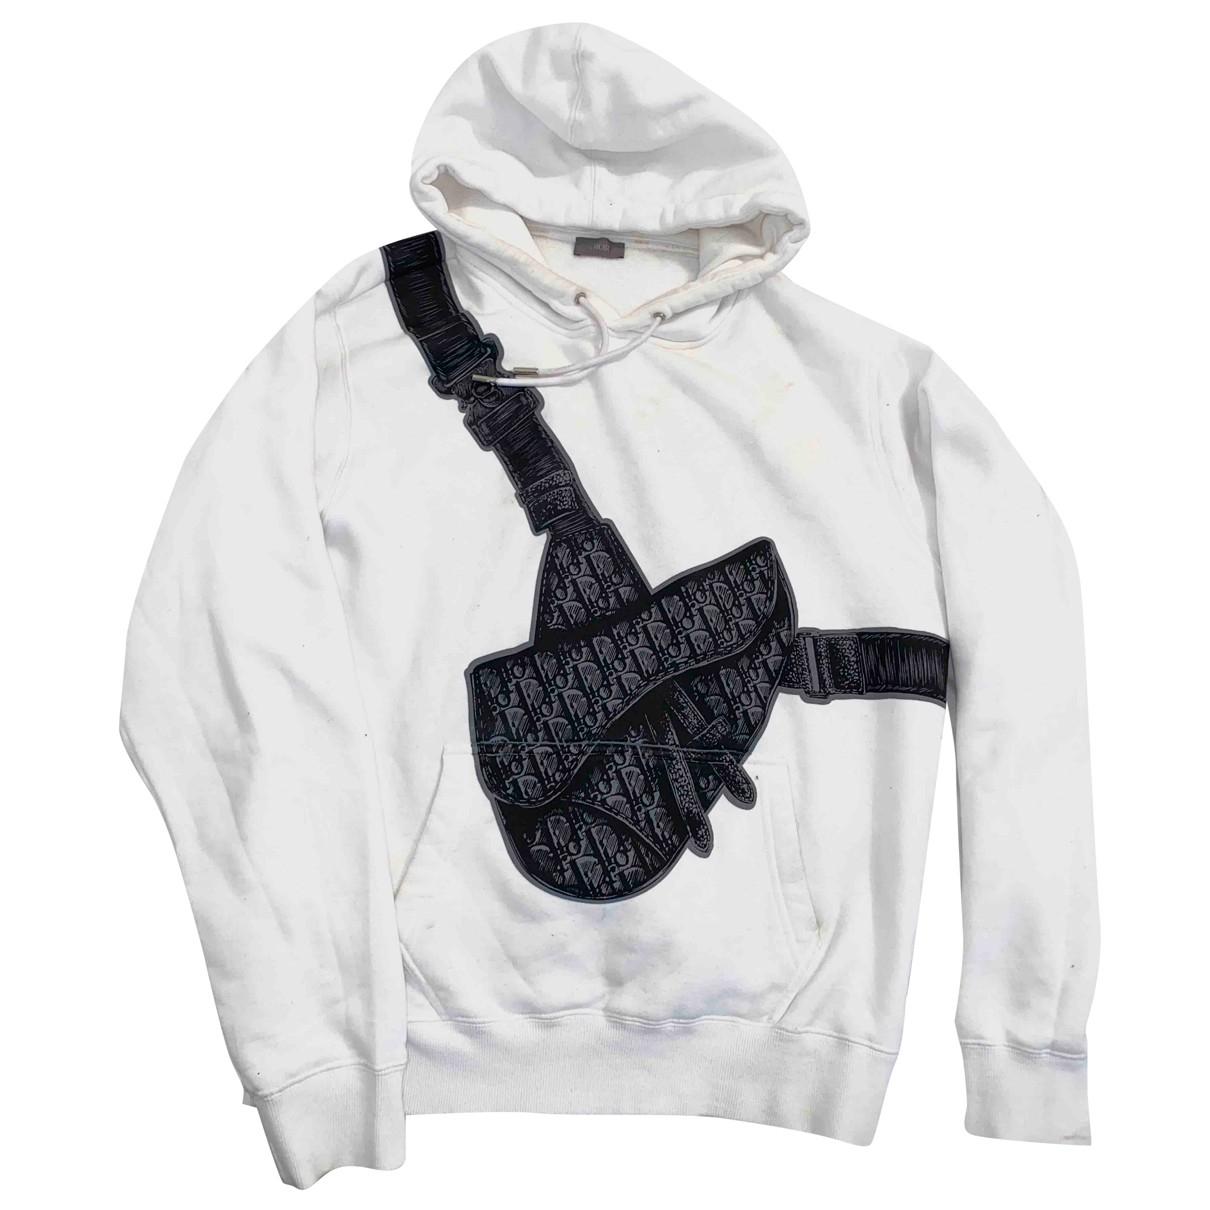 Dior N White Cotton Knitwear & Sweatshirts for Men M International